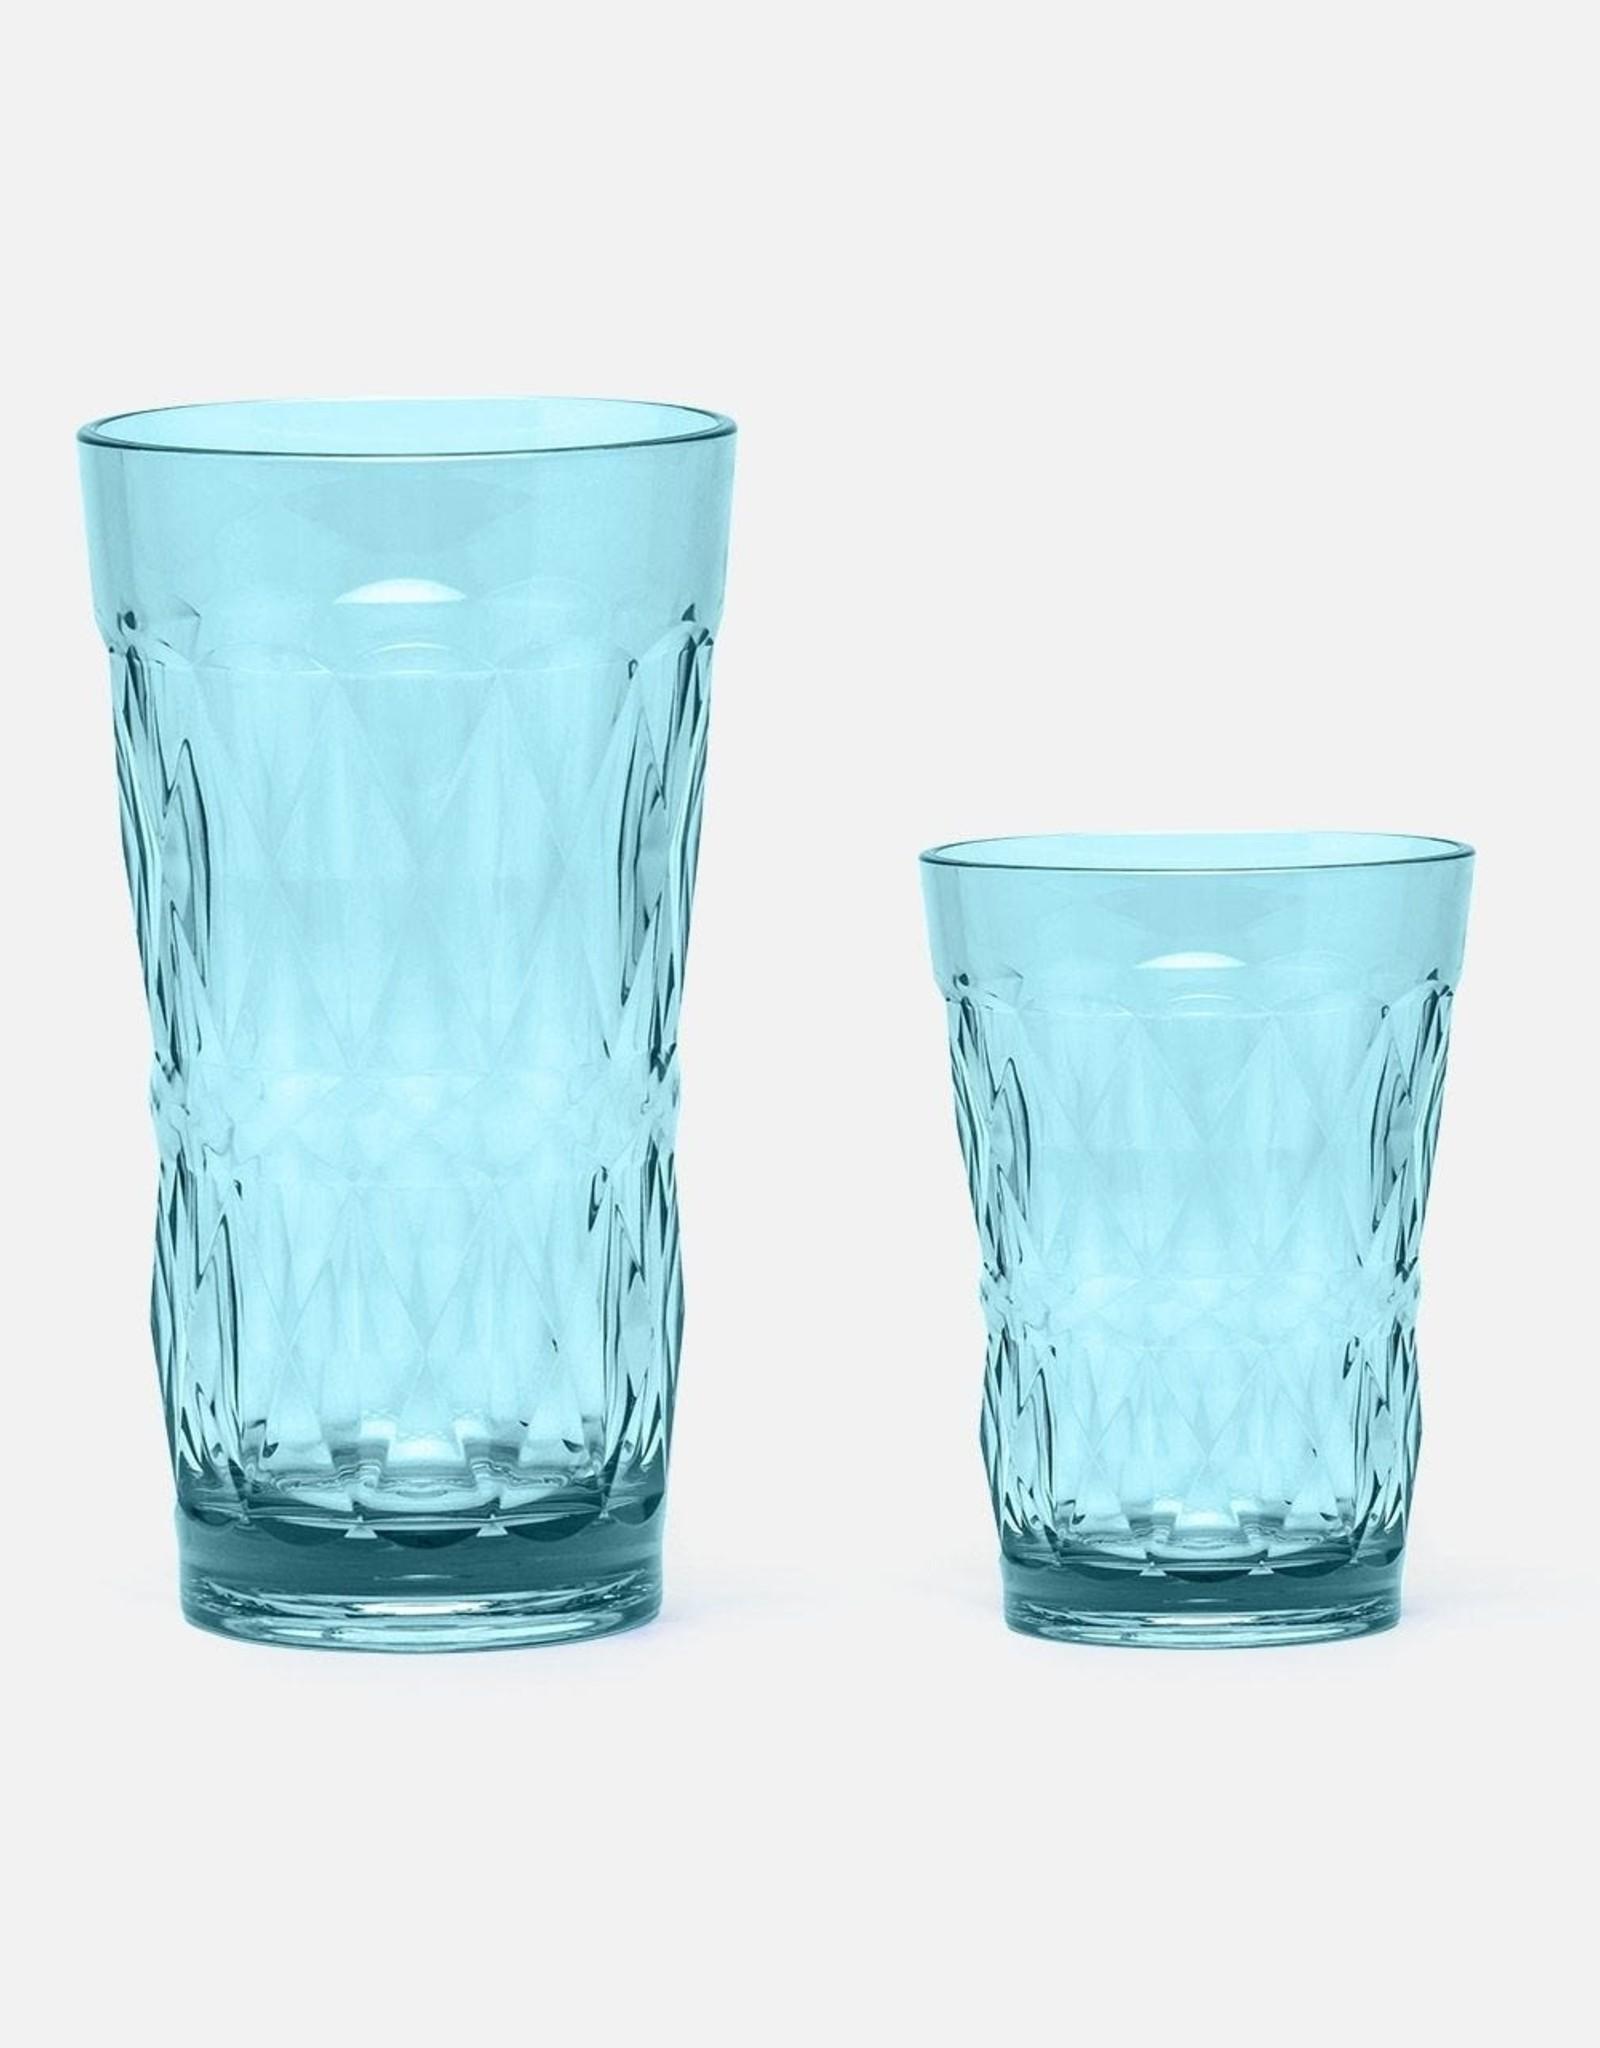 Blue Pheasant Brielle Acrylic Blue Glassware